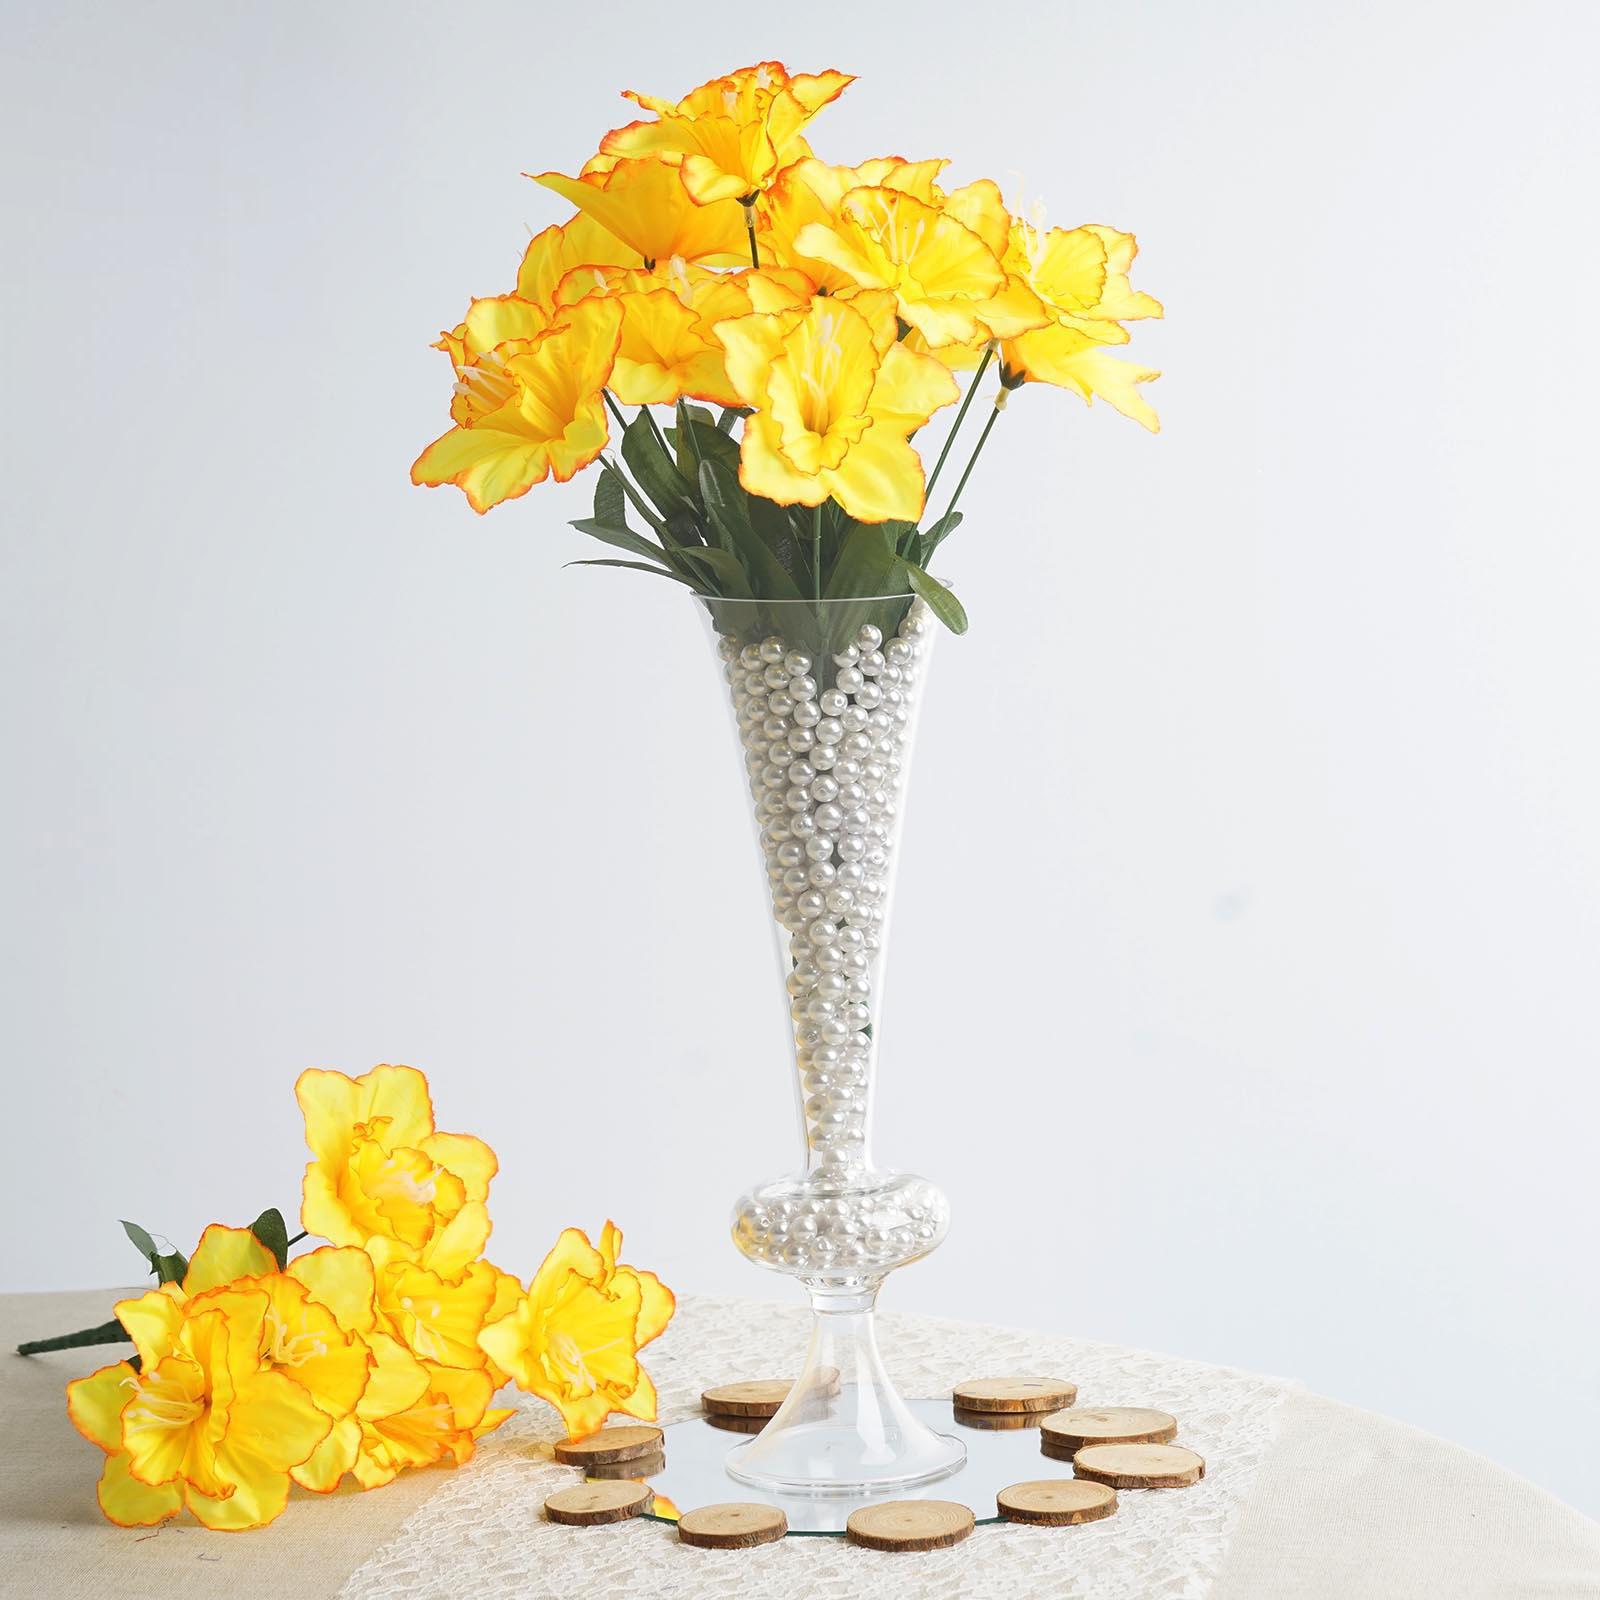 BalsaCircle 72 Silk Daffodil Flowers - 12 bushes - DIY Home Wedding Party Artificial Bouquets Arrangements Centerpieces